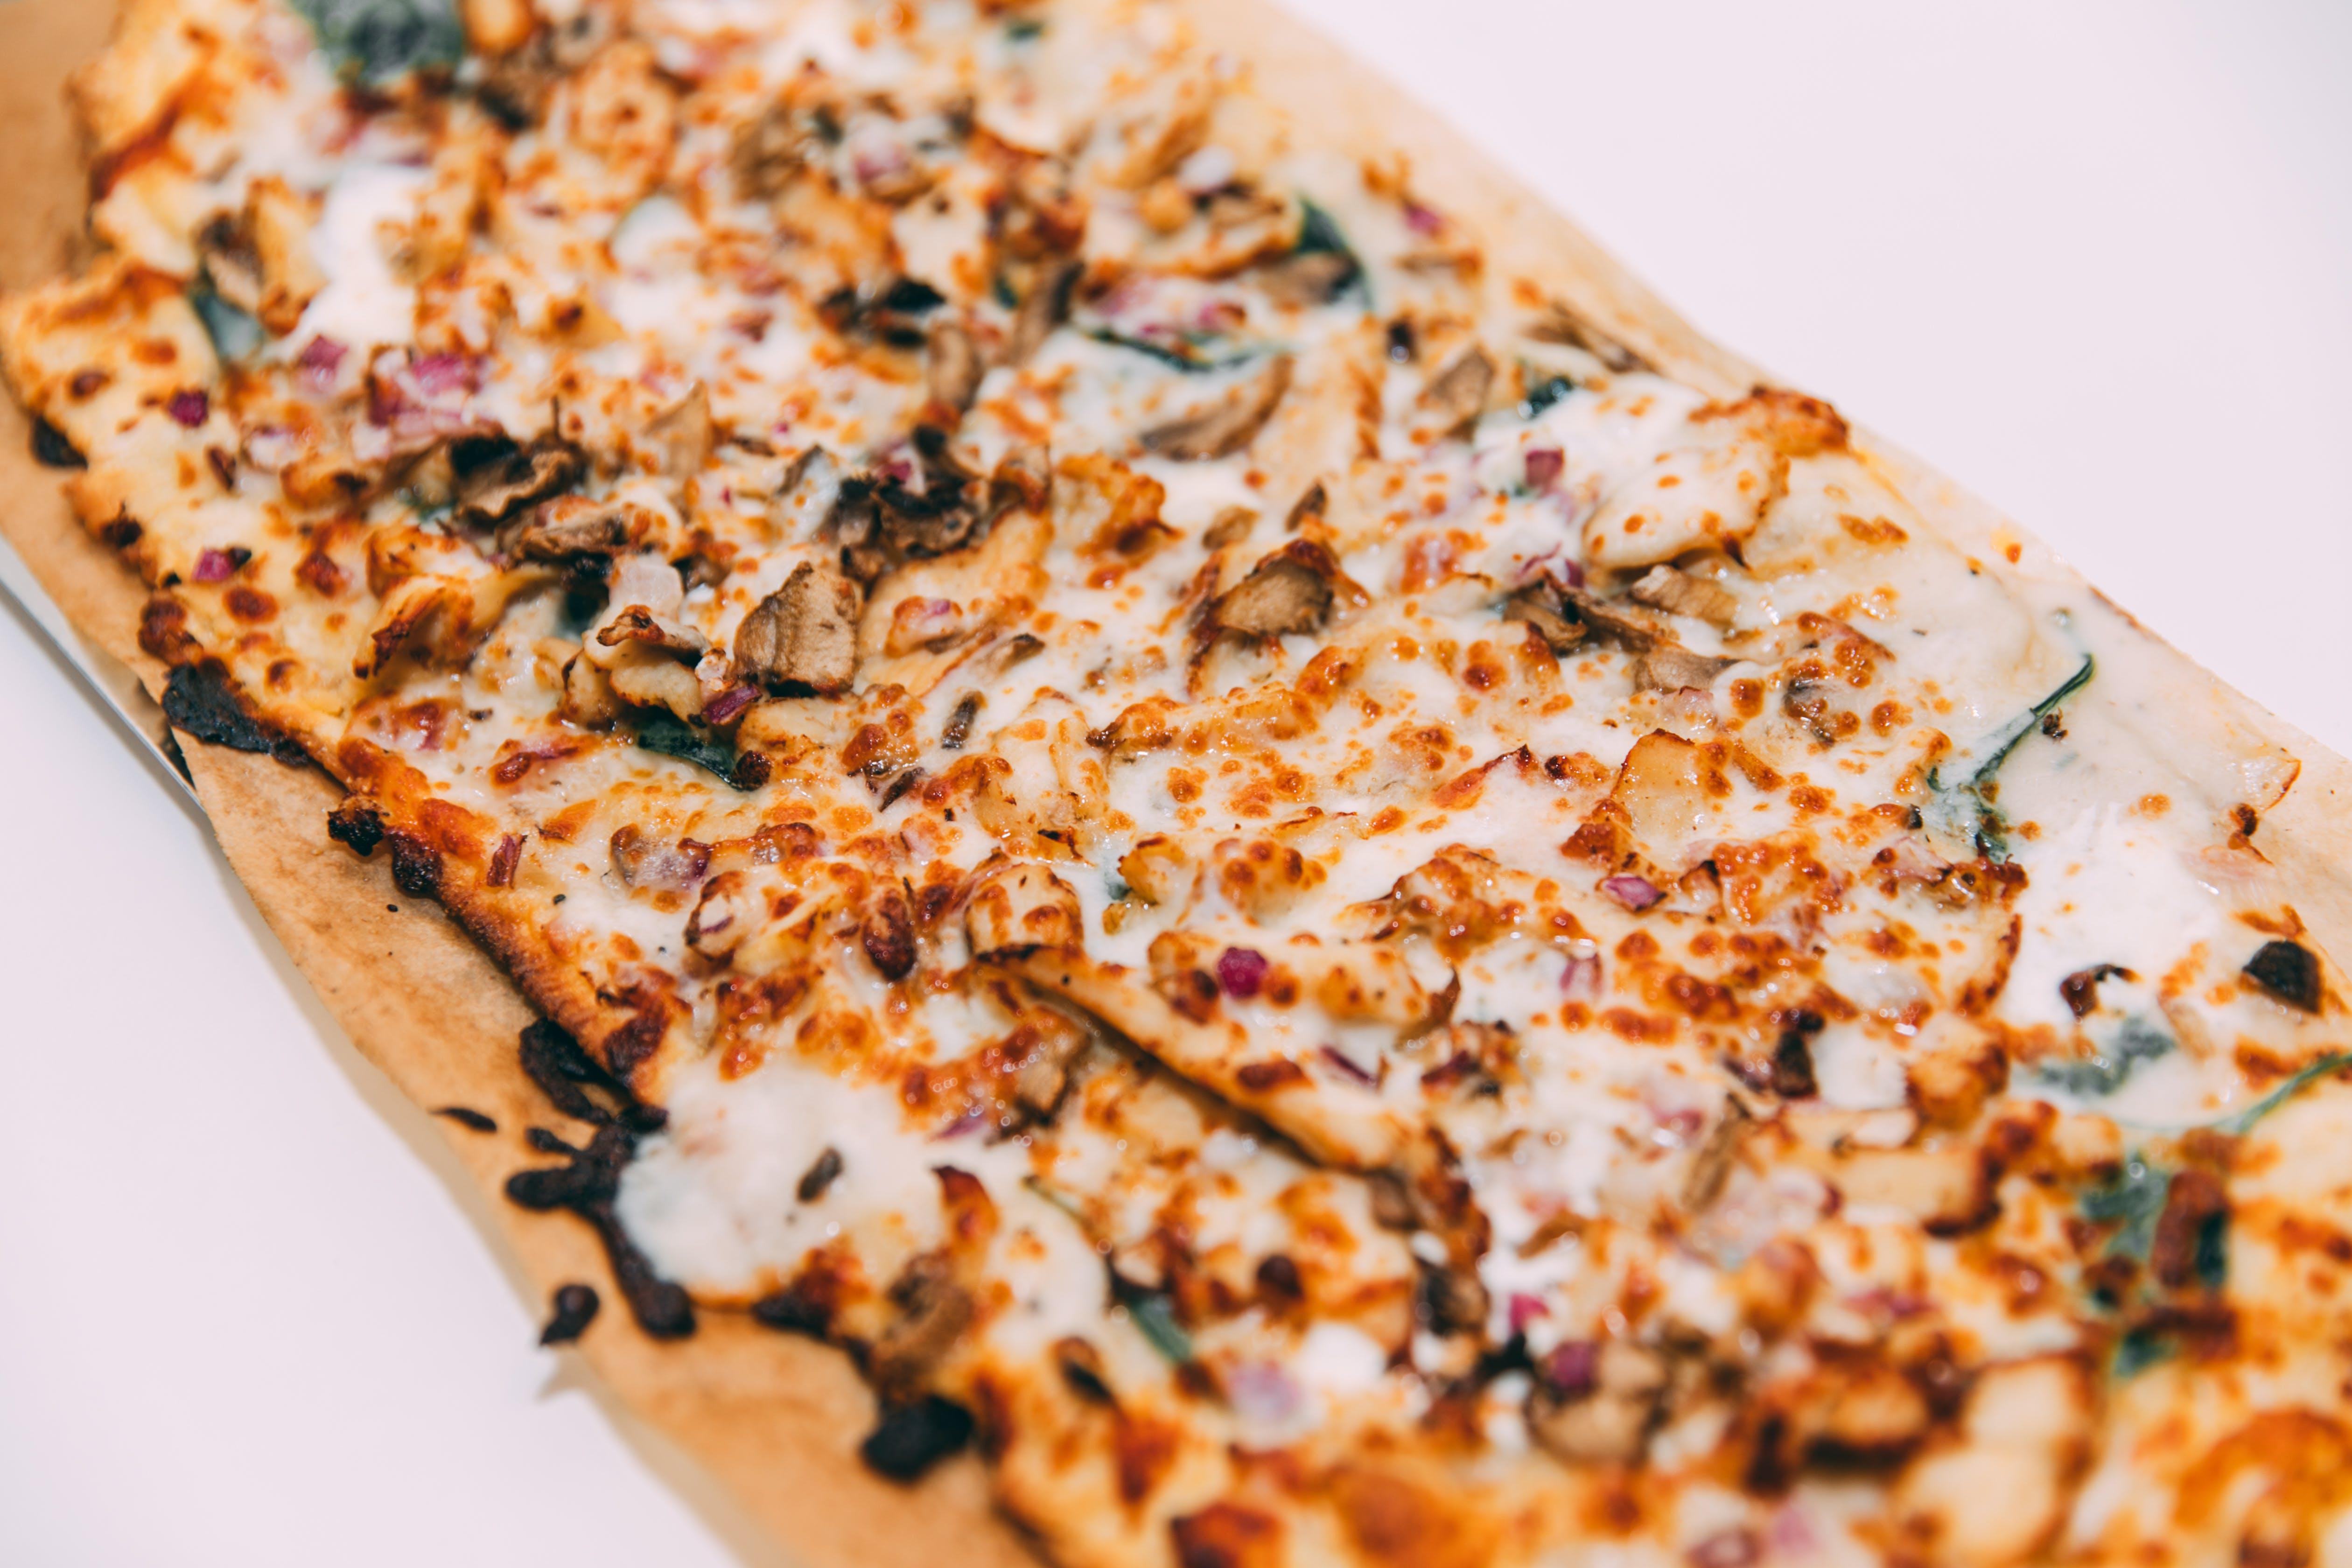 Slim & Husky's - Smokin Herb with Chicken Pizza - 4 Pack